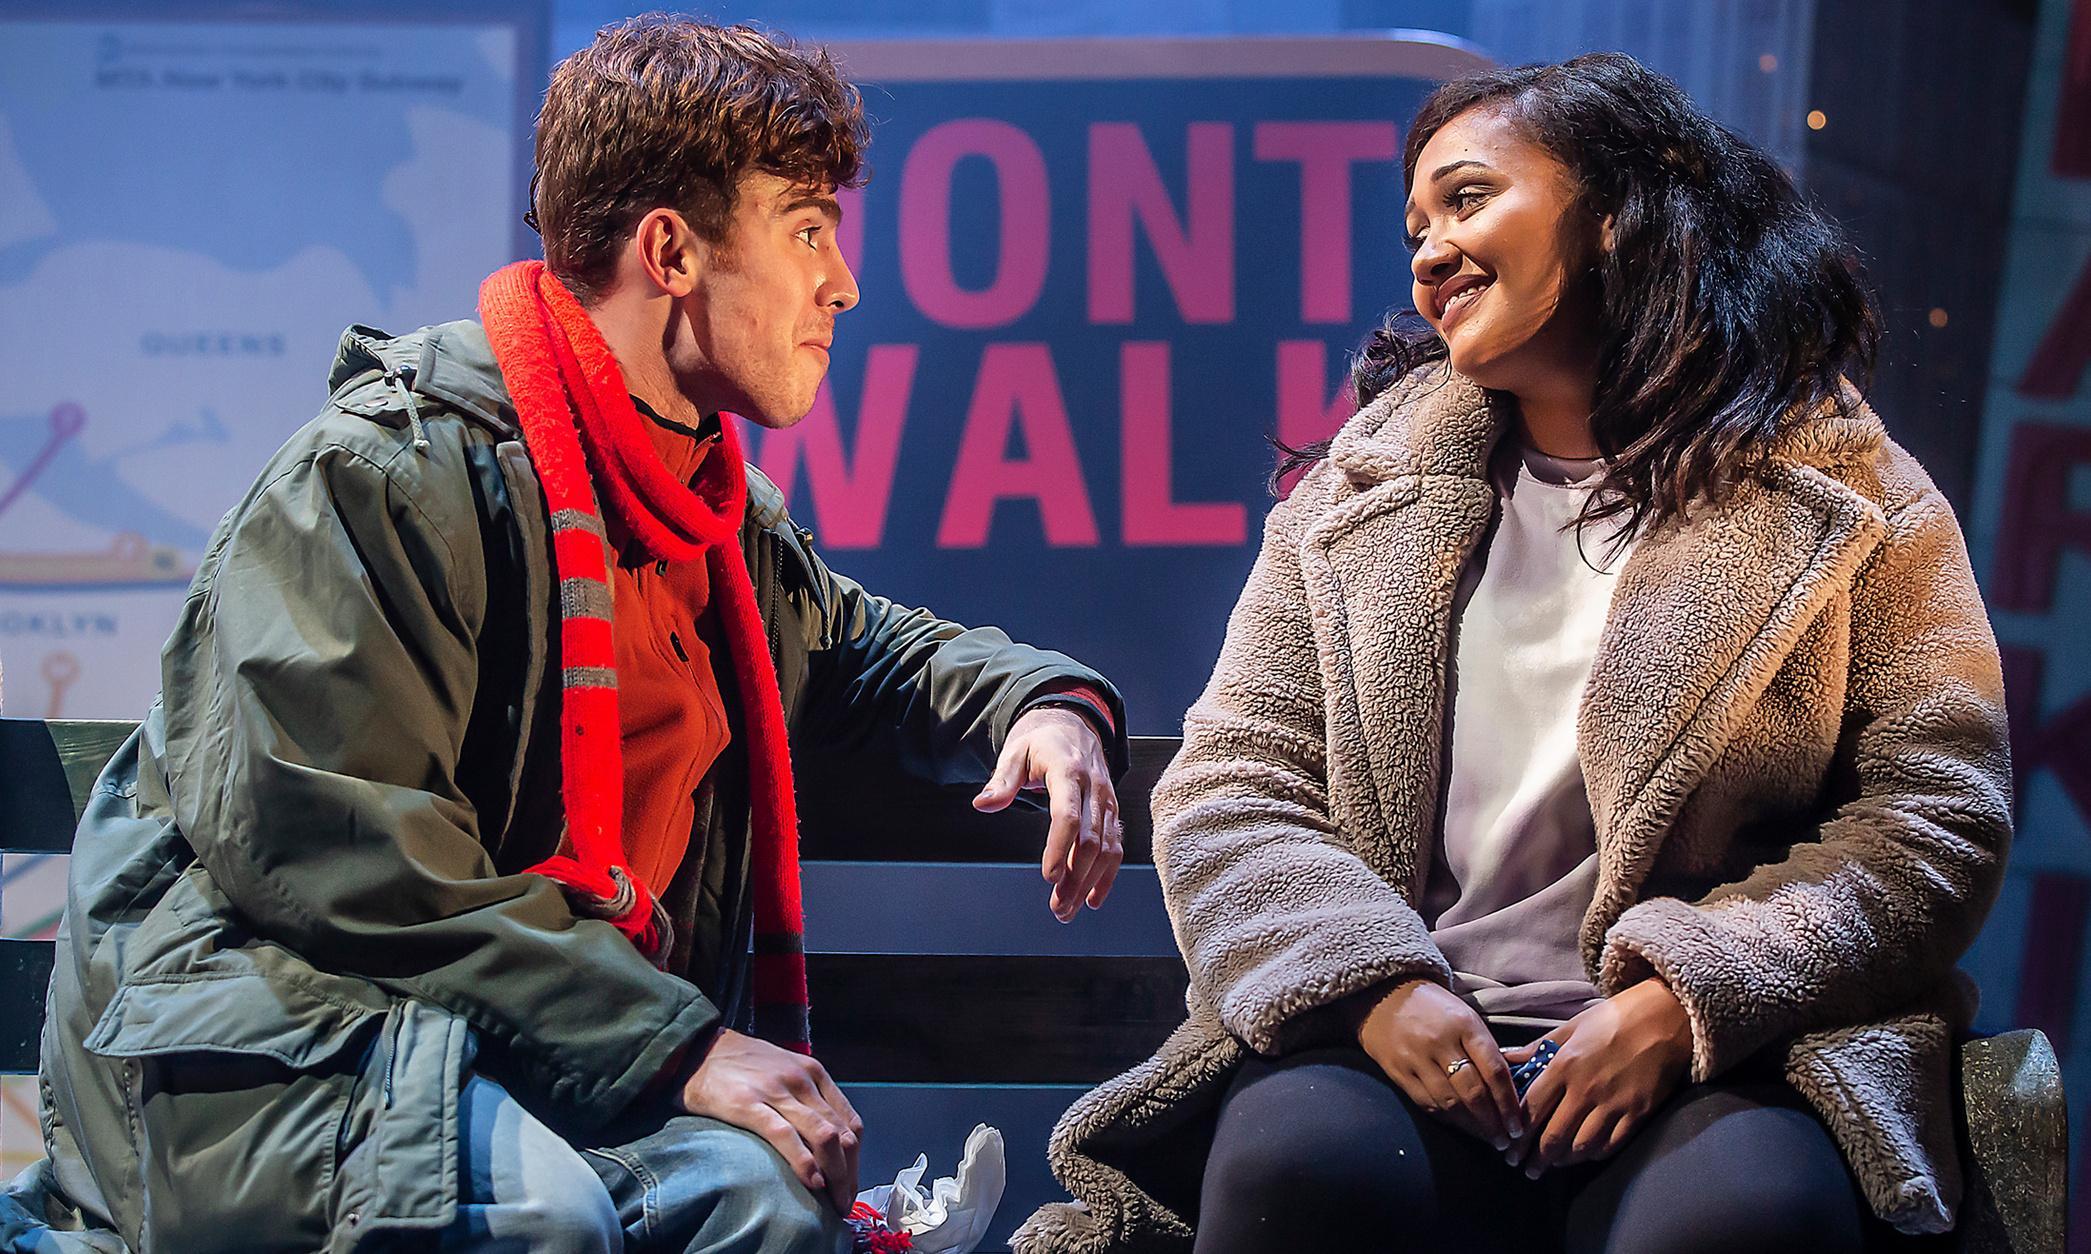 The Season review – musical romcom hits a feelgood festive note